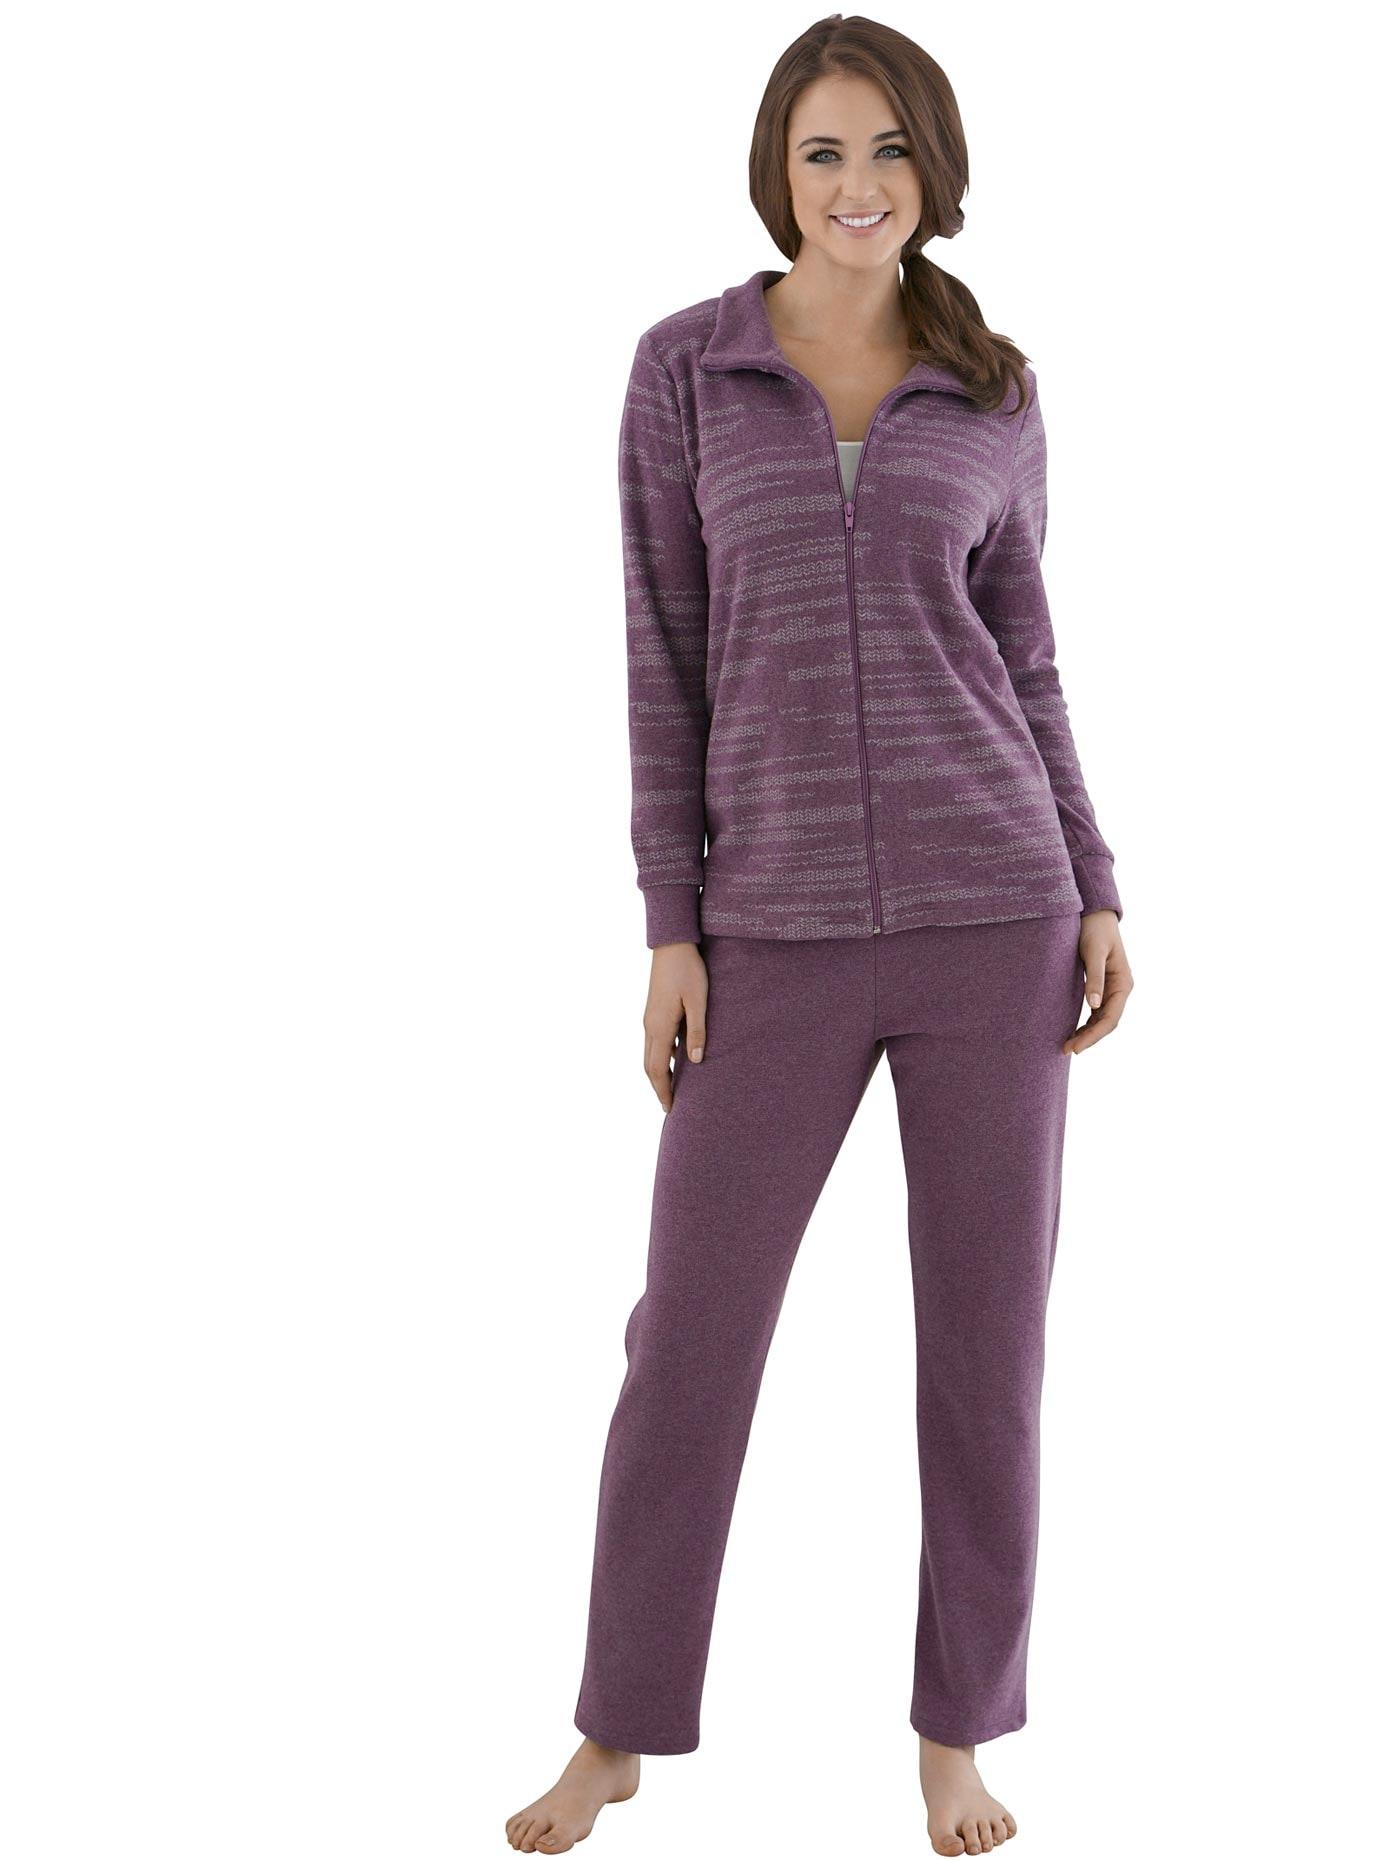 Plantier Hausanzug | Bekleidung > Homewear > Hausanzüge | Rot | Plantier